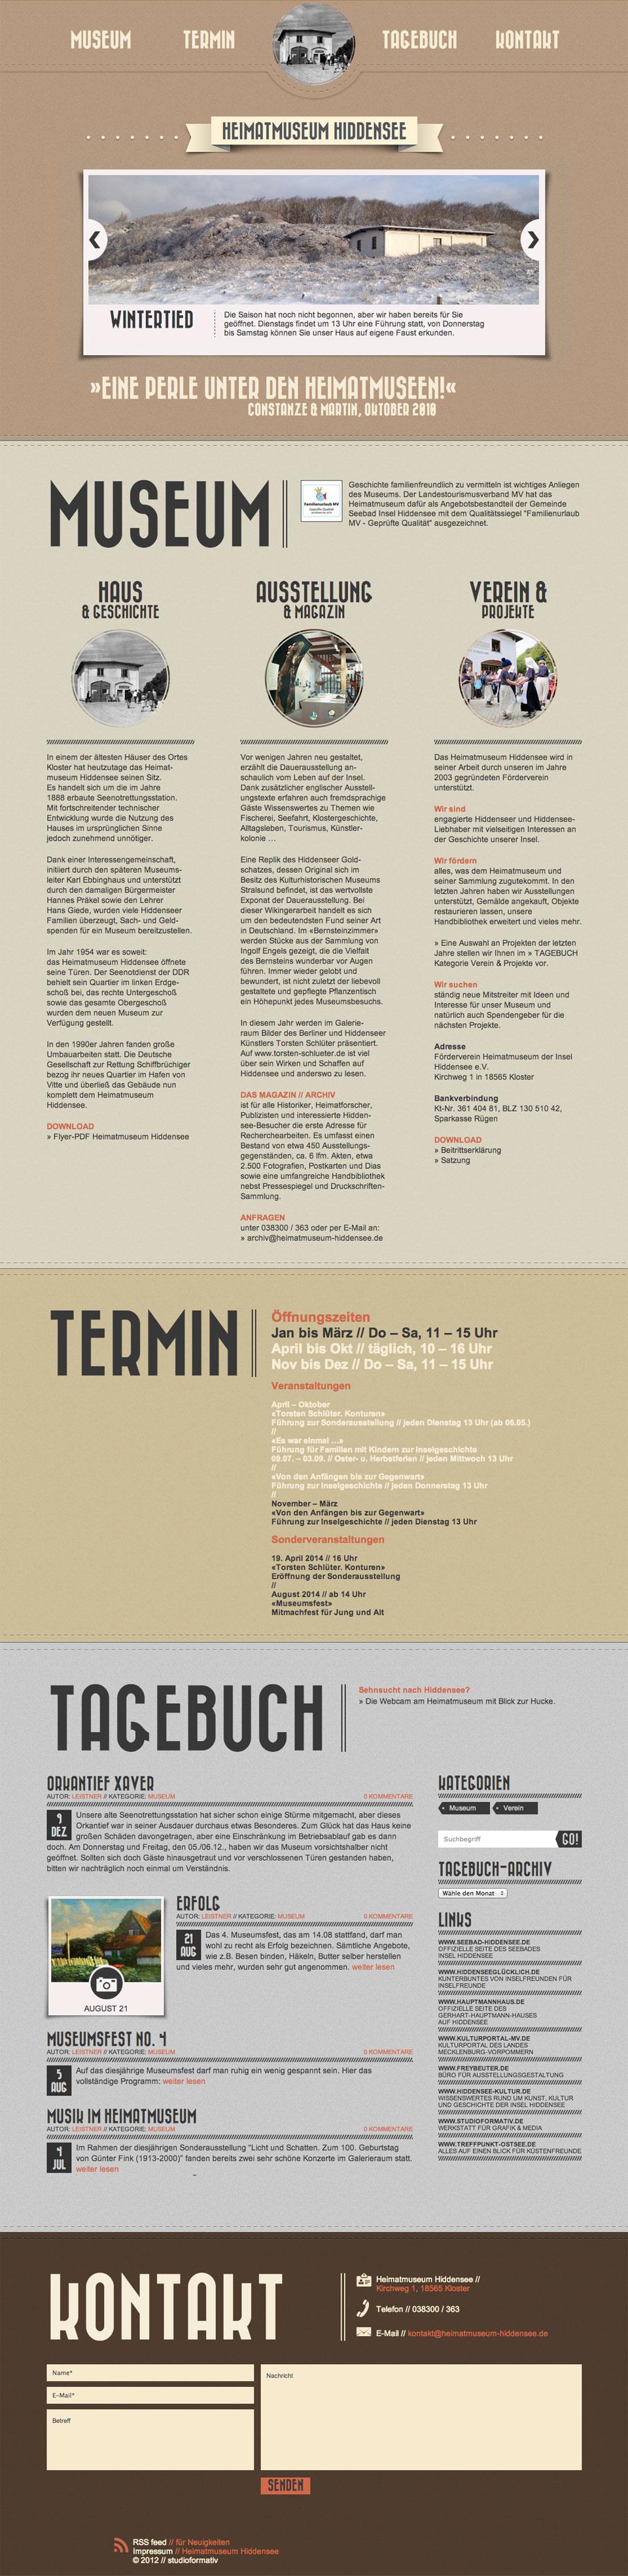 heimatmuseum-hiddensee-onepage-website